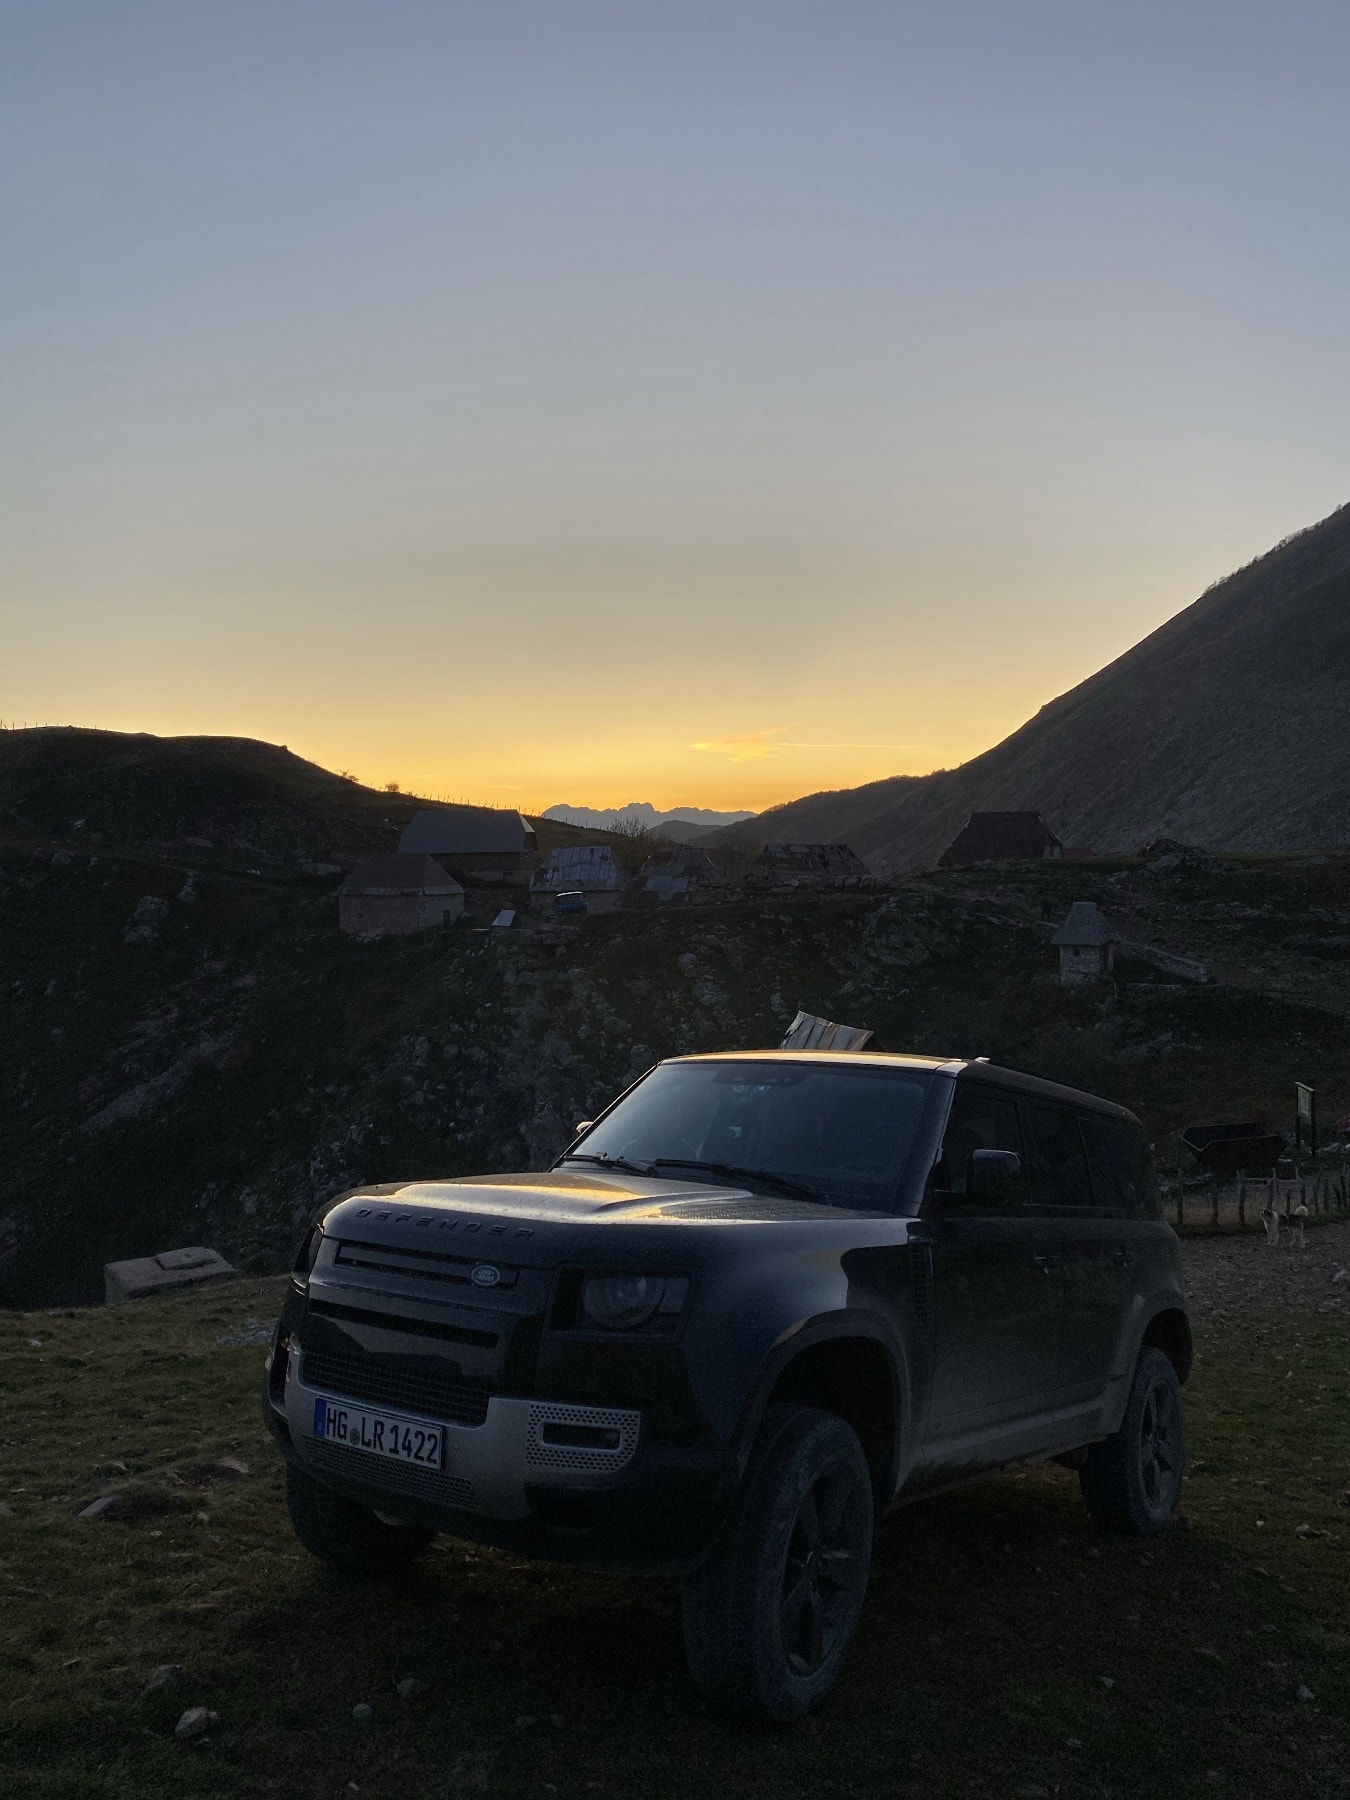 So close to heaven - In The Mountain Village Lukomir 16